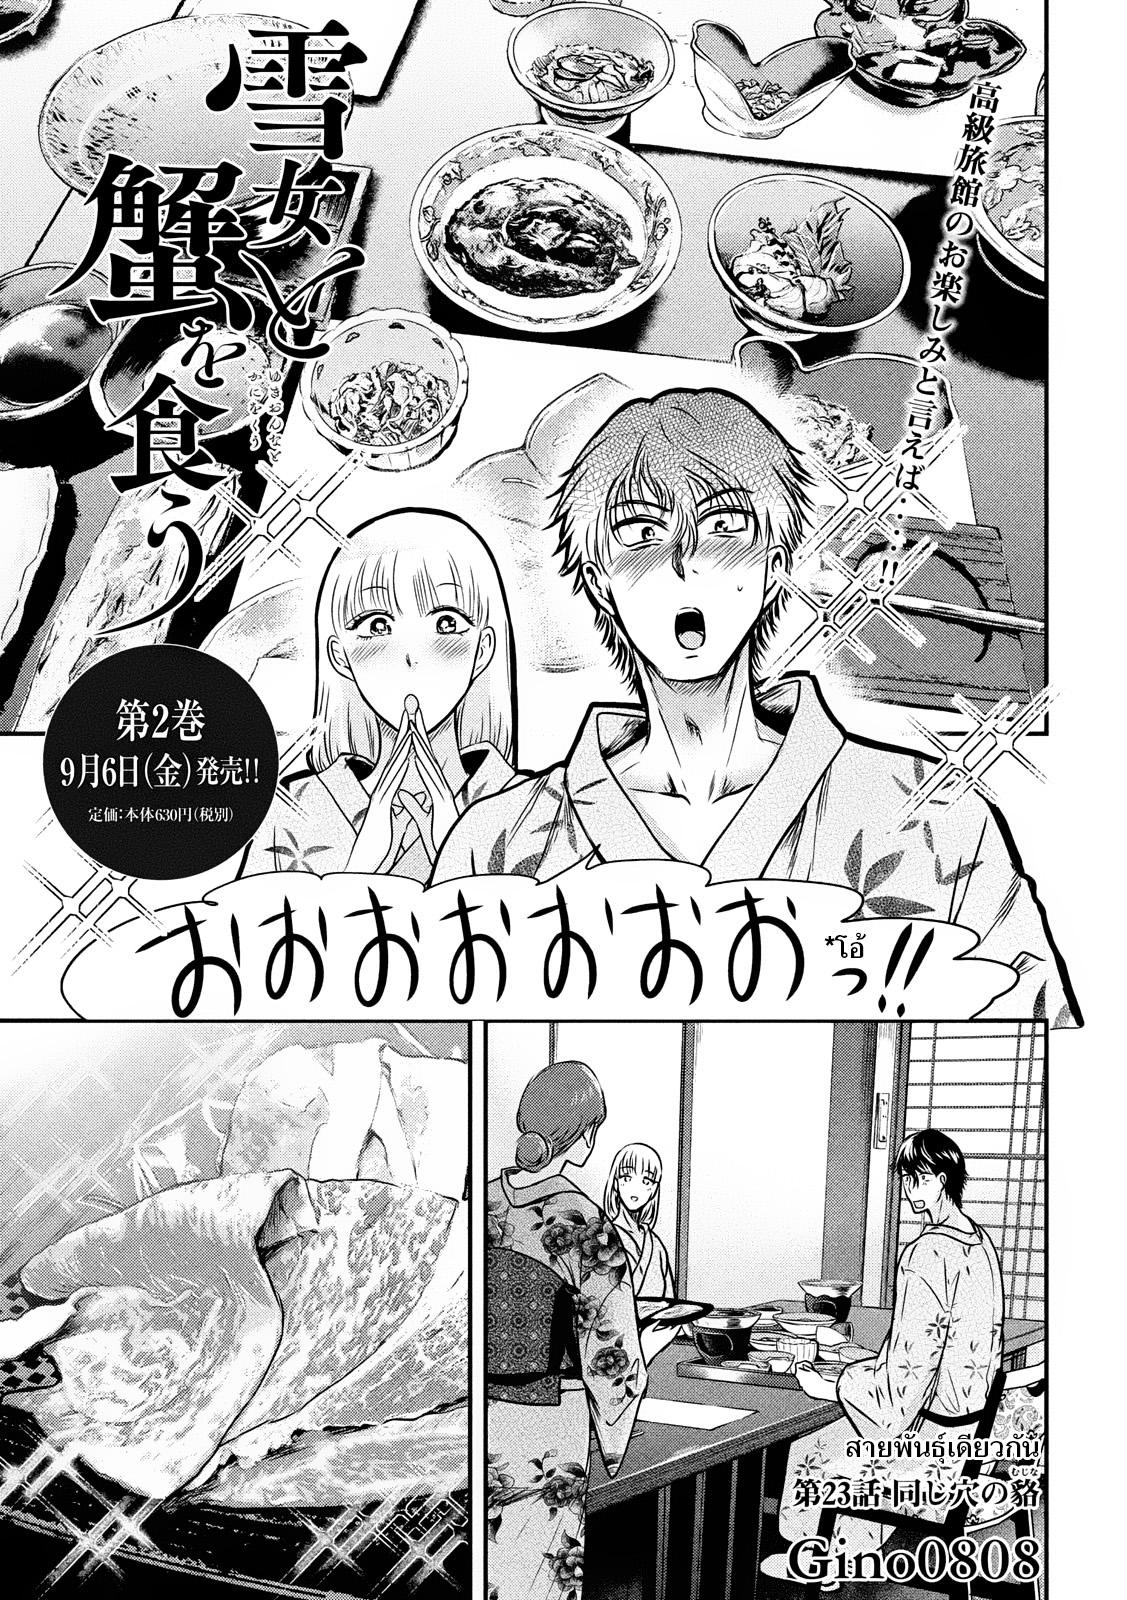 Yukionna to Kani wo Kuu-ตอนที่ 23